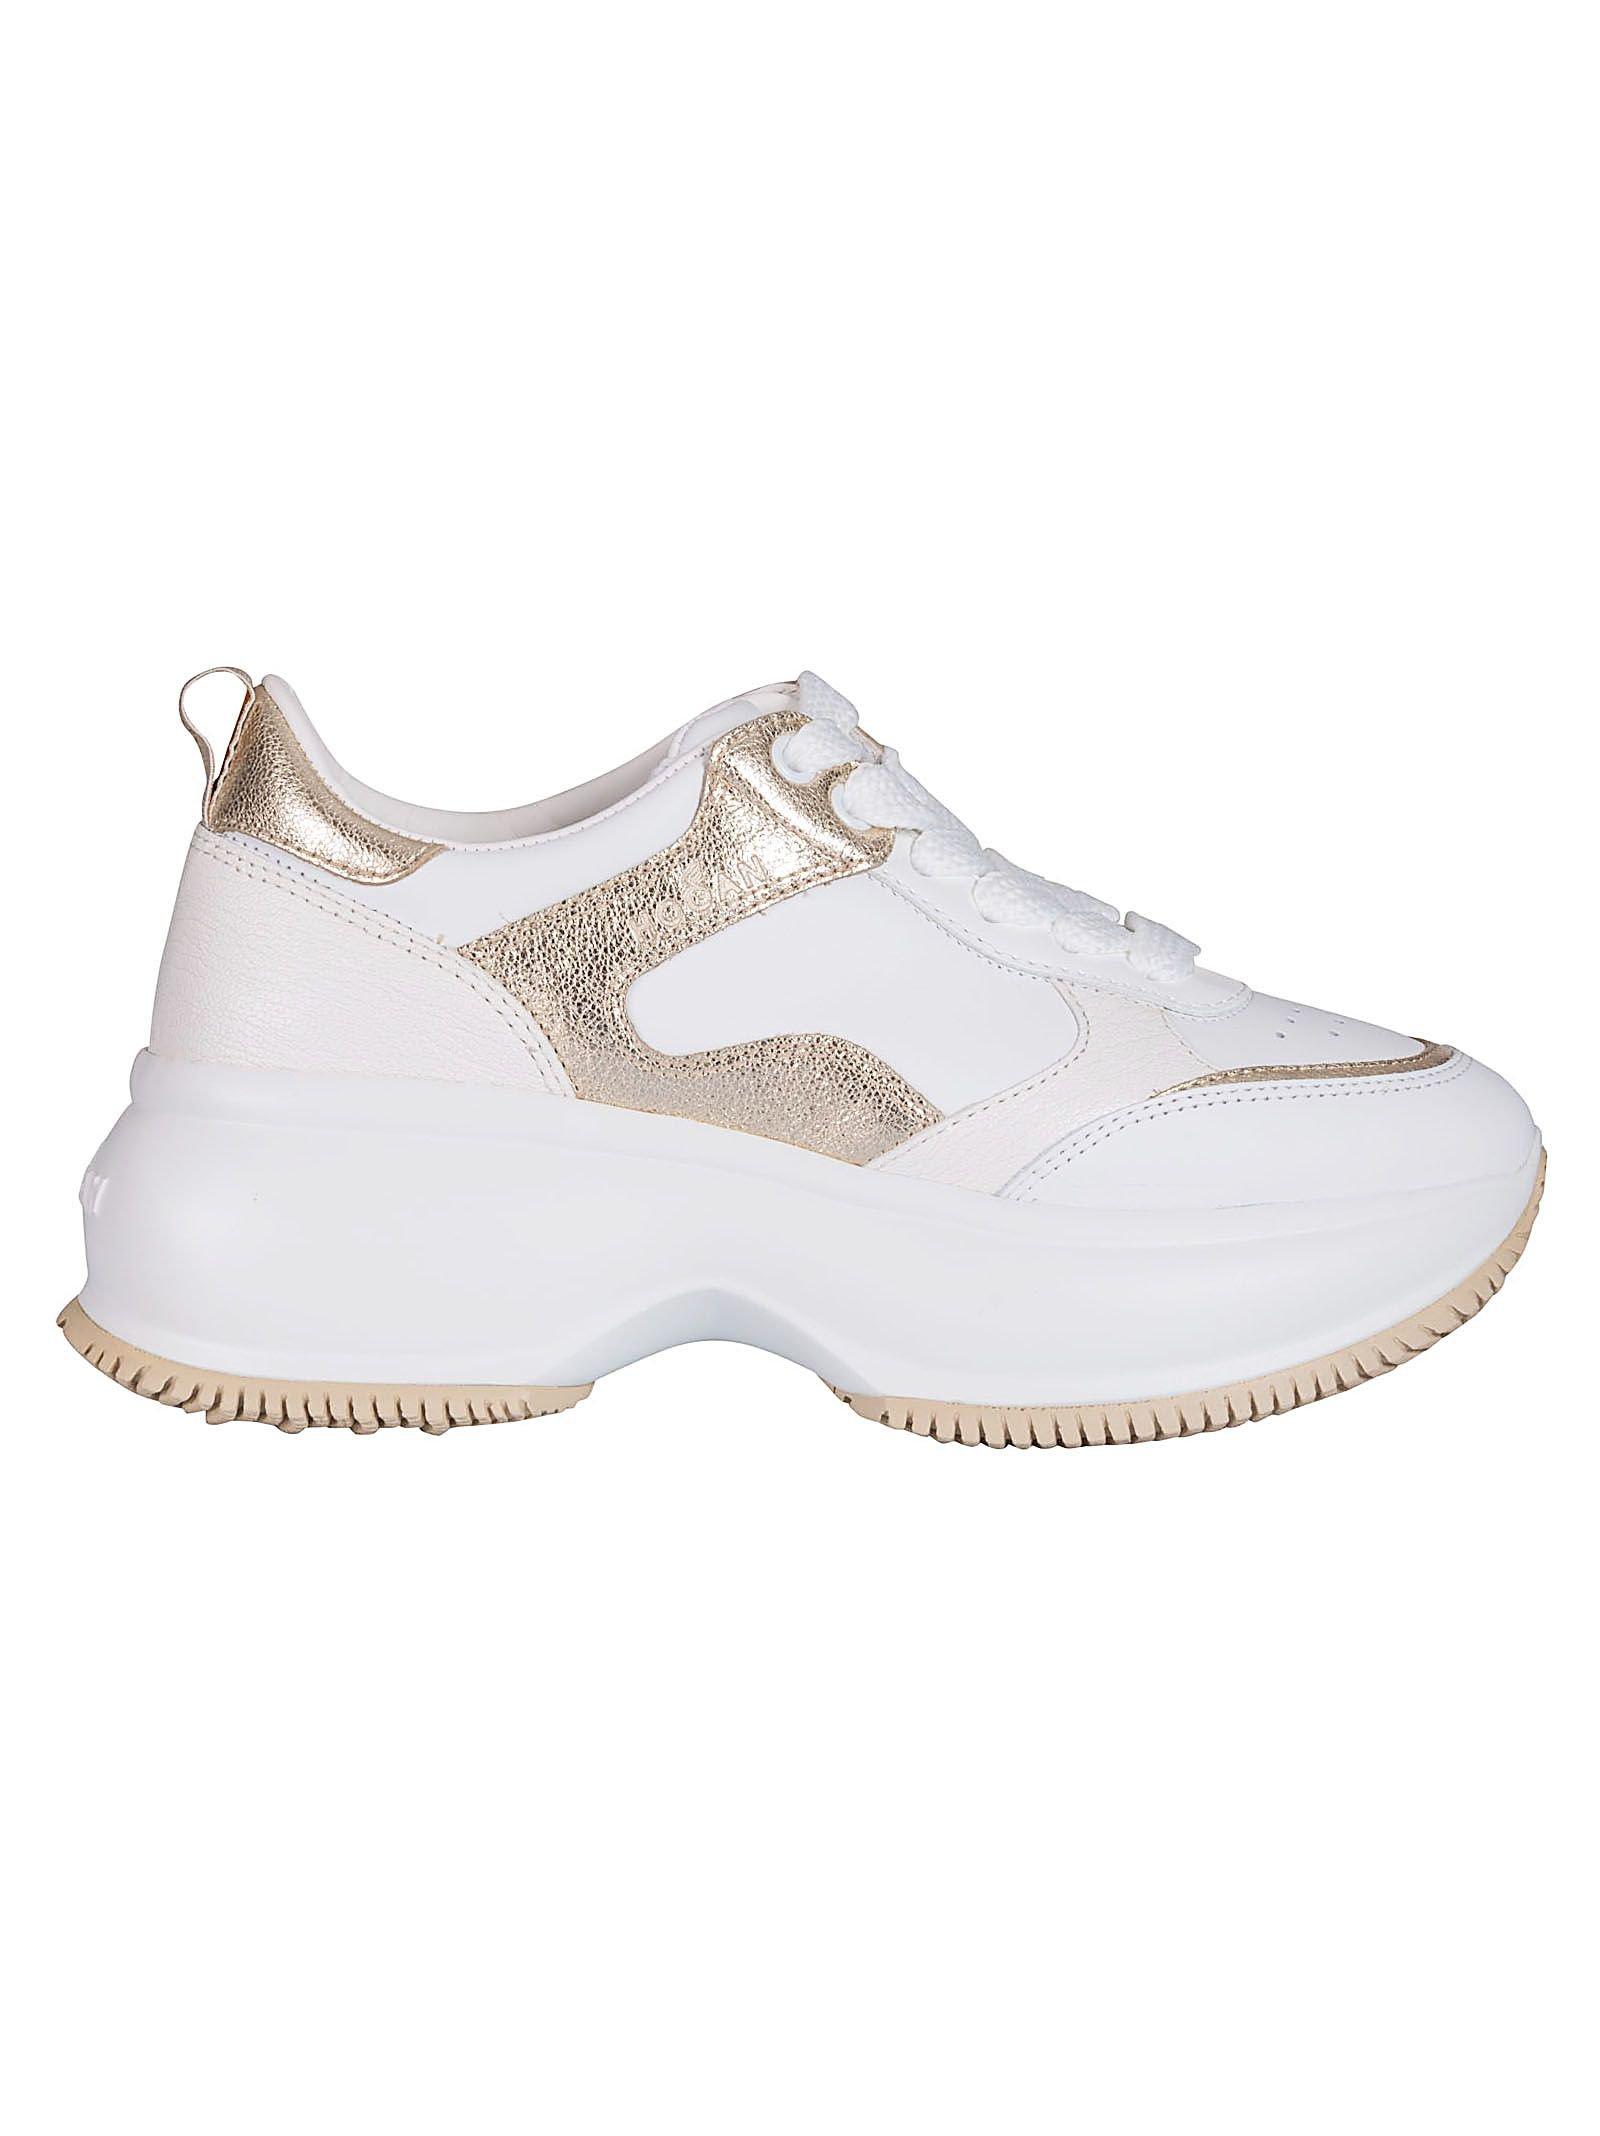 Hogan Classic Sneakers